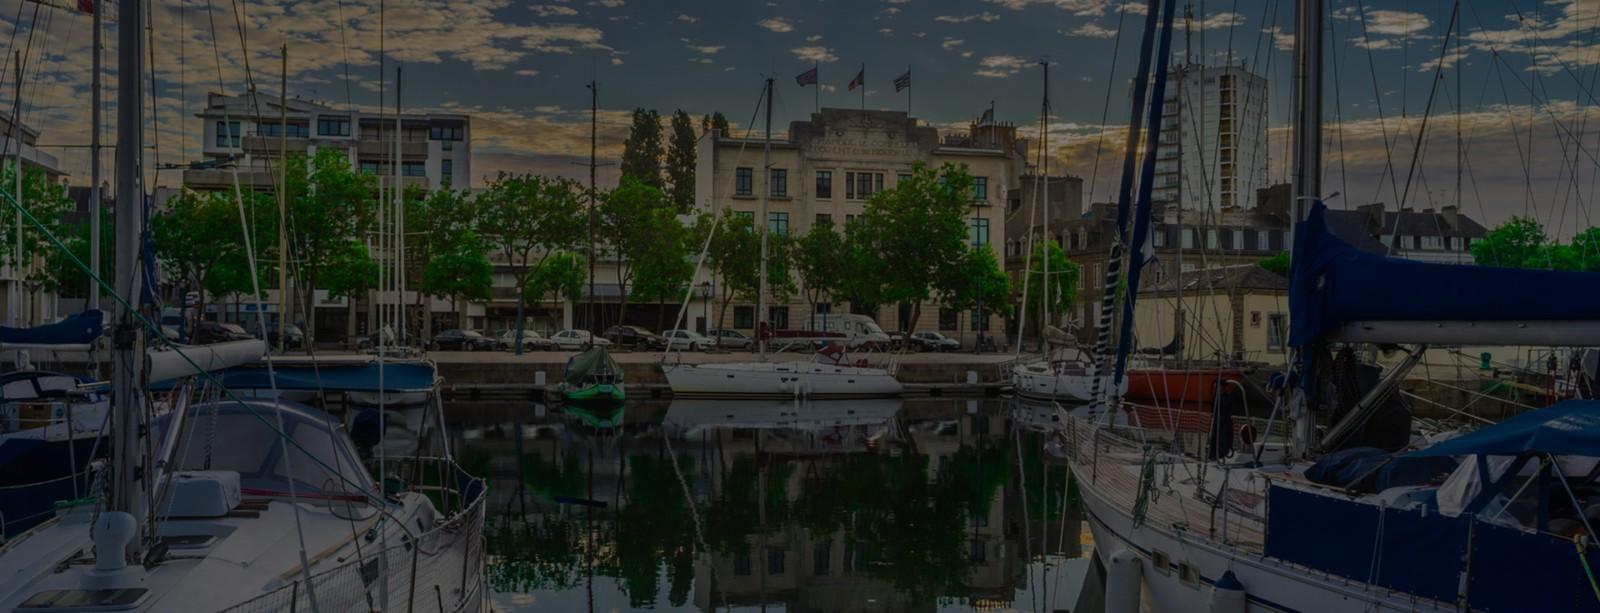 Lorient Accueil